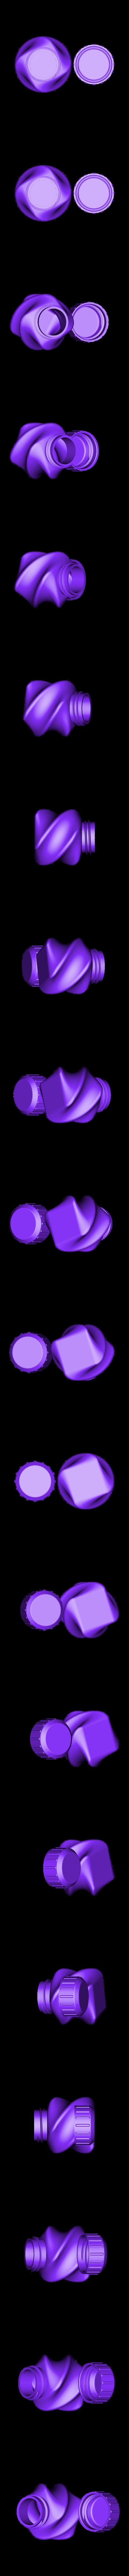 Bottle_and_Screw_Cap_45a.stl Download STL file Bottle and Screw Cap 45 AB • 3D printable template, David_Mussaffi